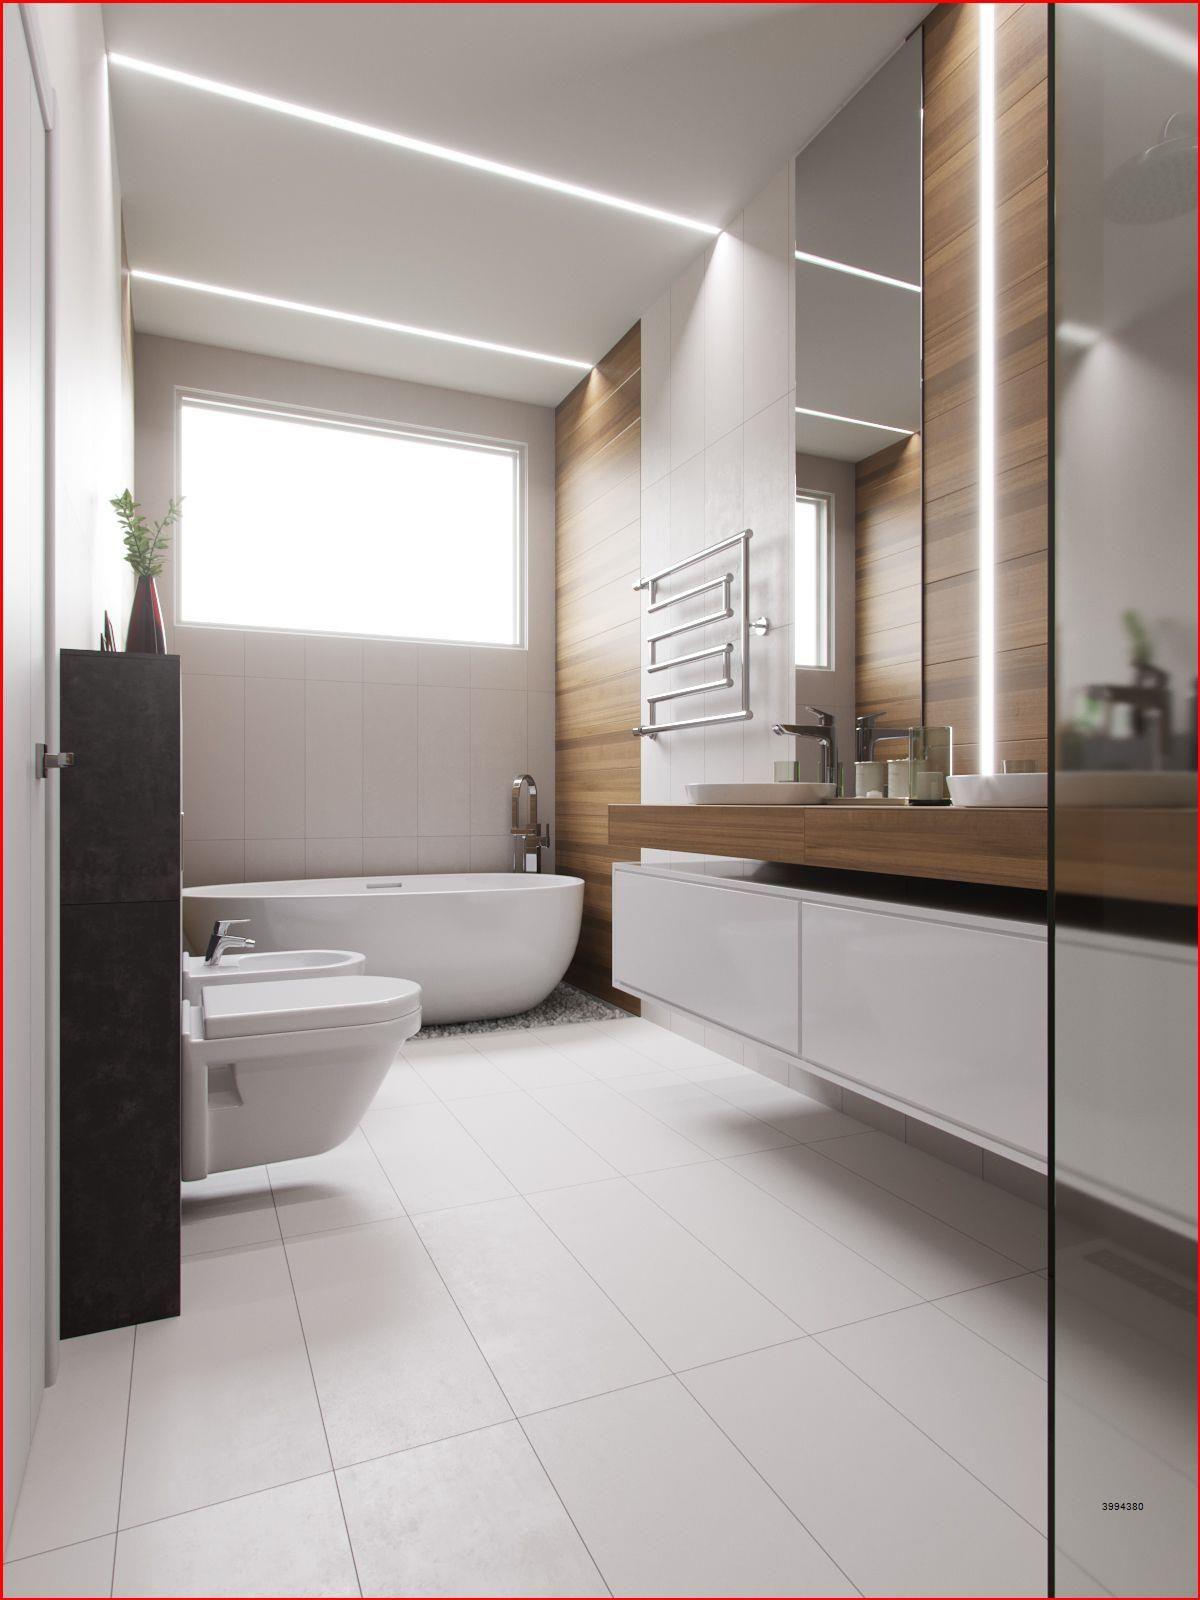 Bookcase Bookshelf Wooden Decorative Design Special Process Etsy Best Bathroom Designs Bathroom Design Luxury Bathroom Interior Design